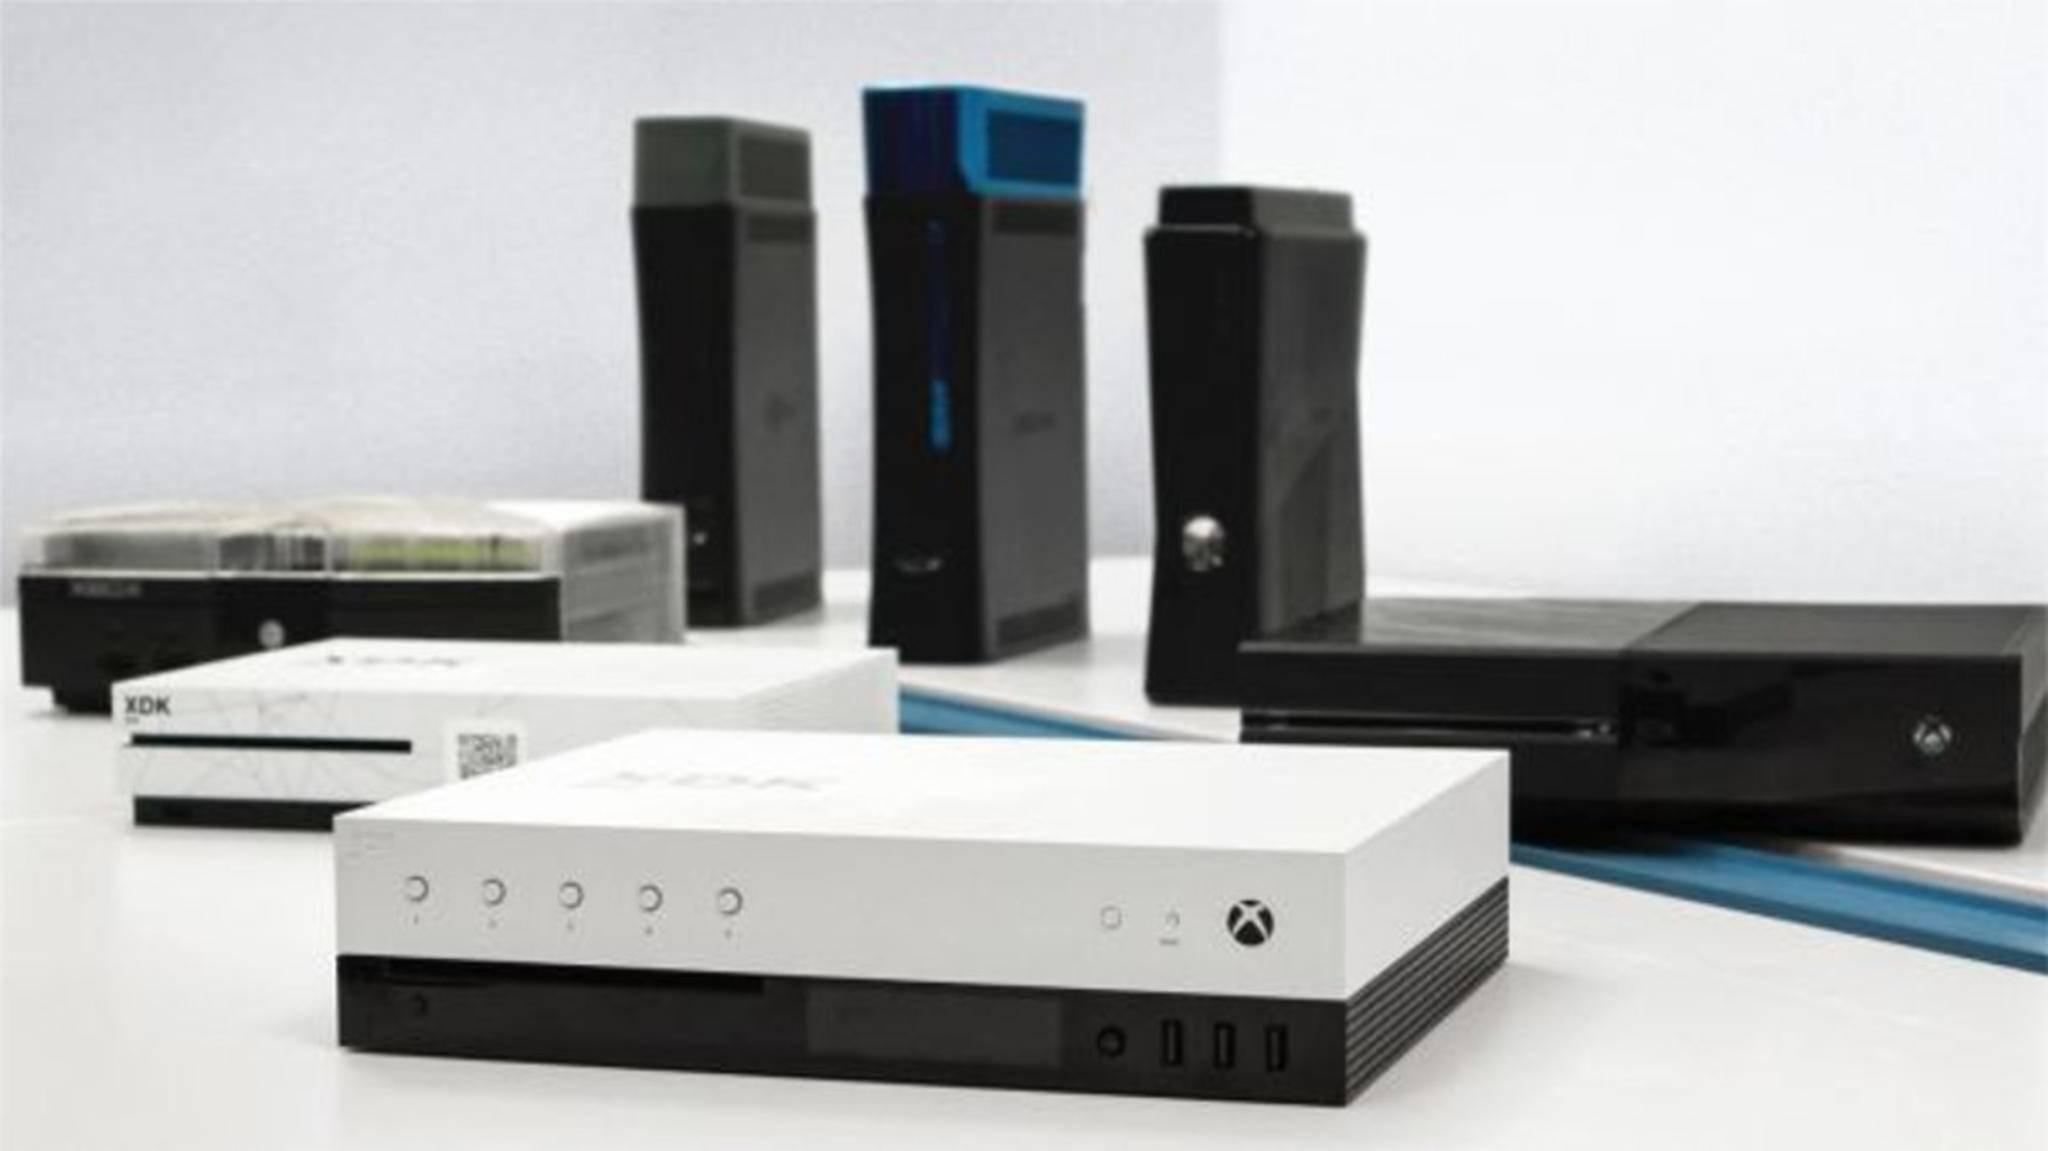 So sieht das Dev Kit der Xbox Scorpio aus.